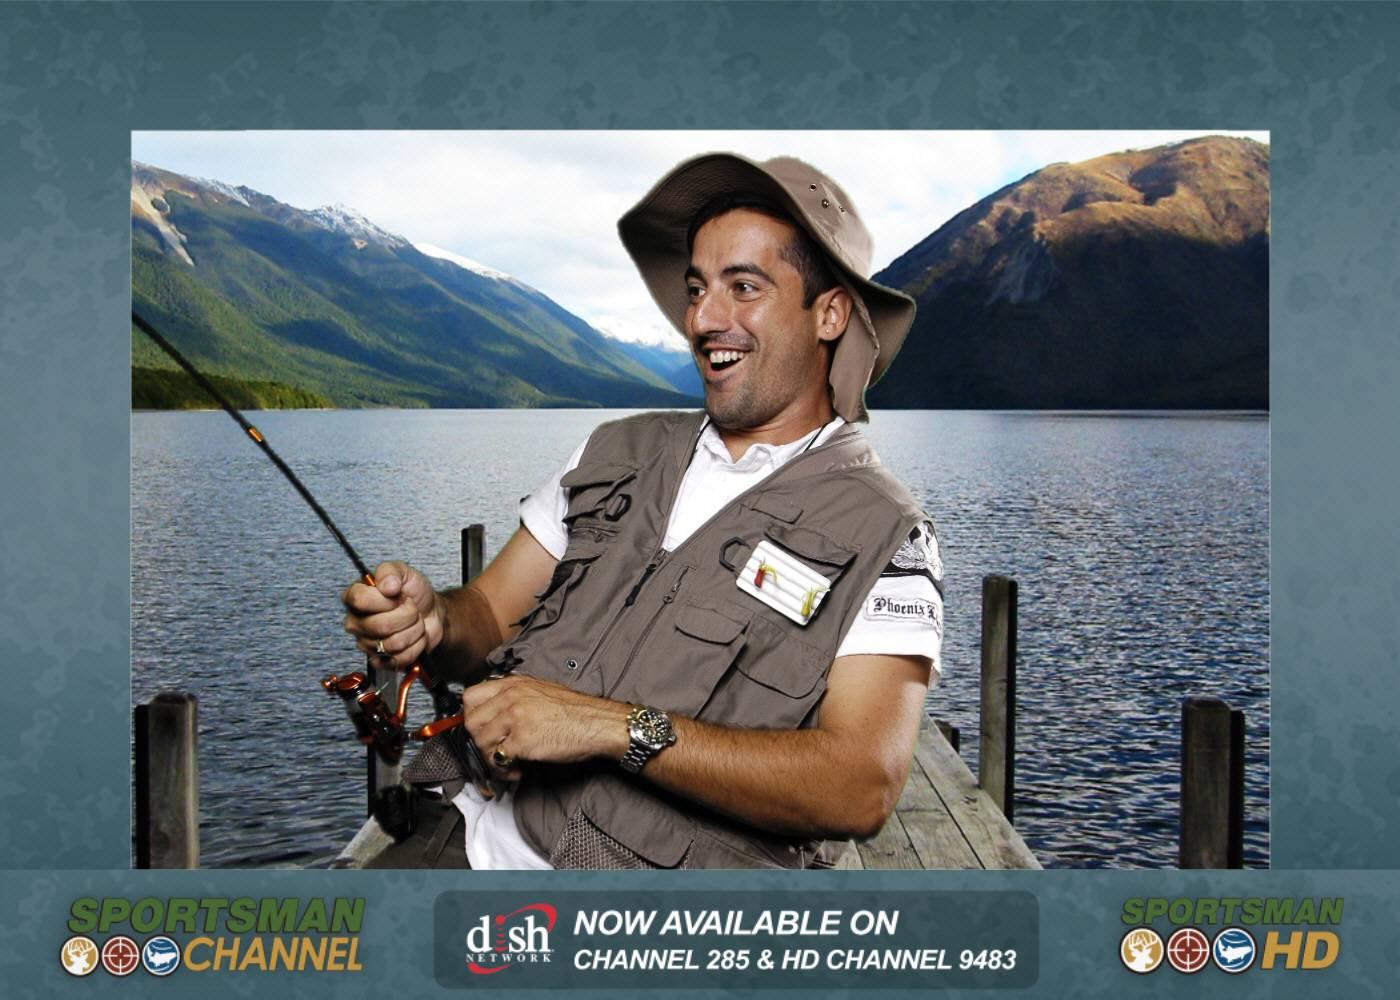 Fishing, Sports, Green Screen Photo Booth